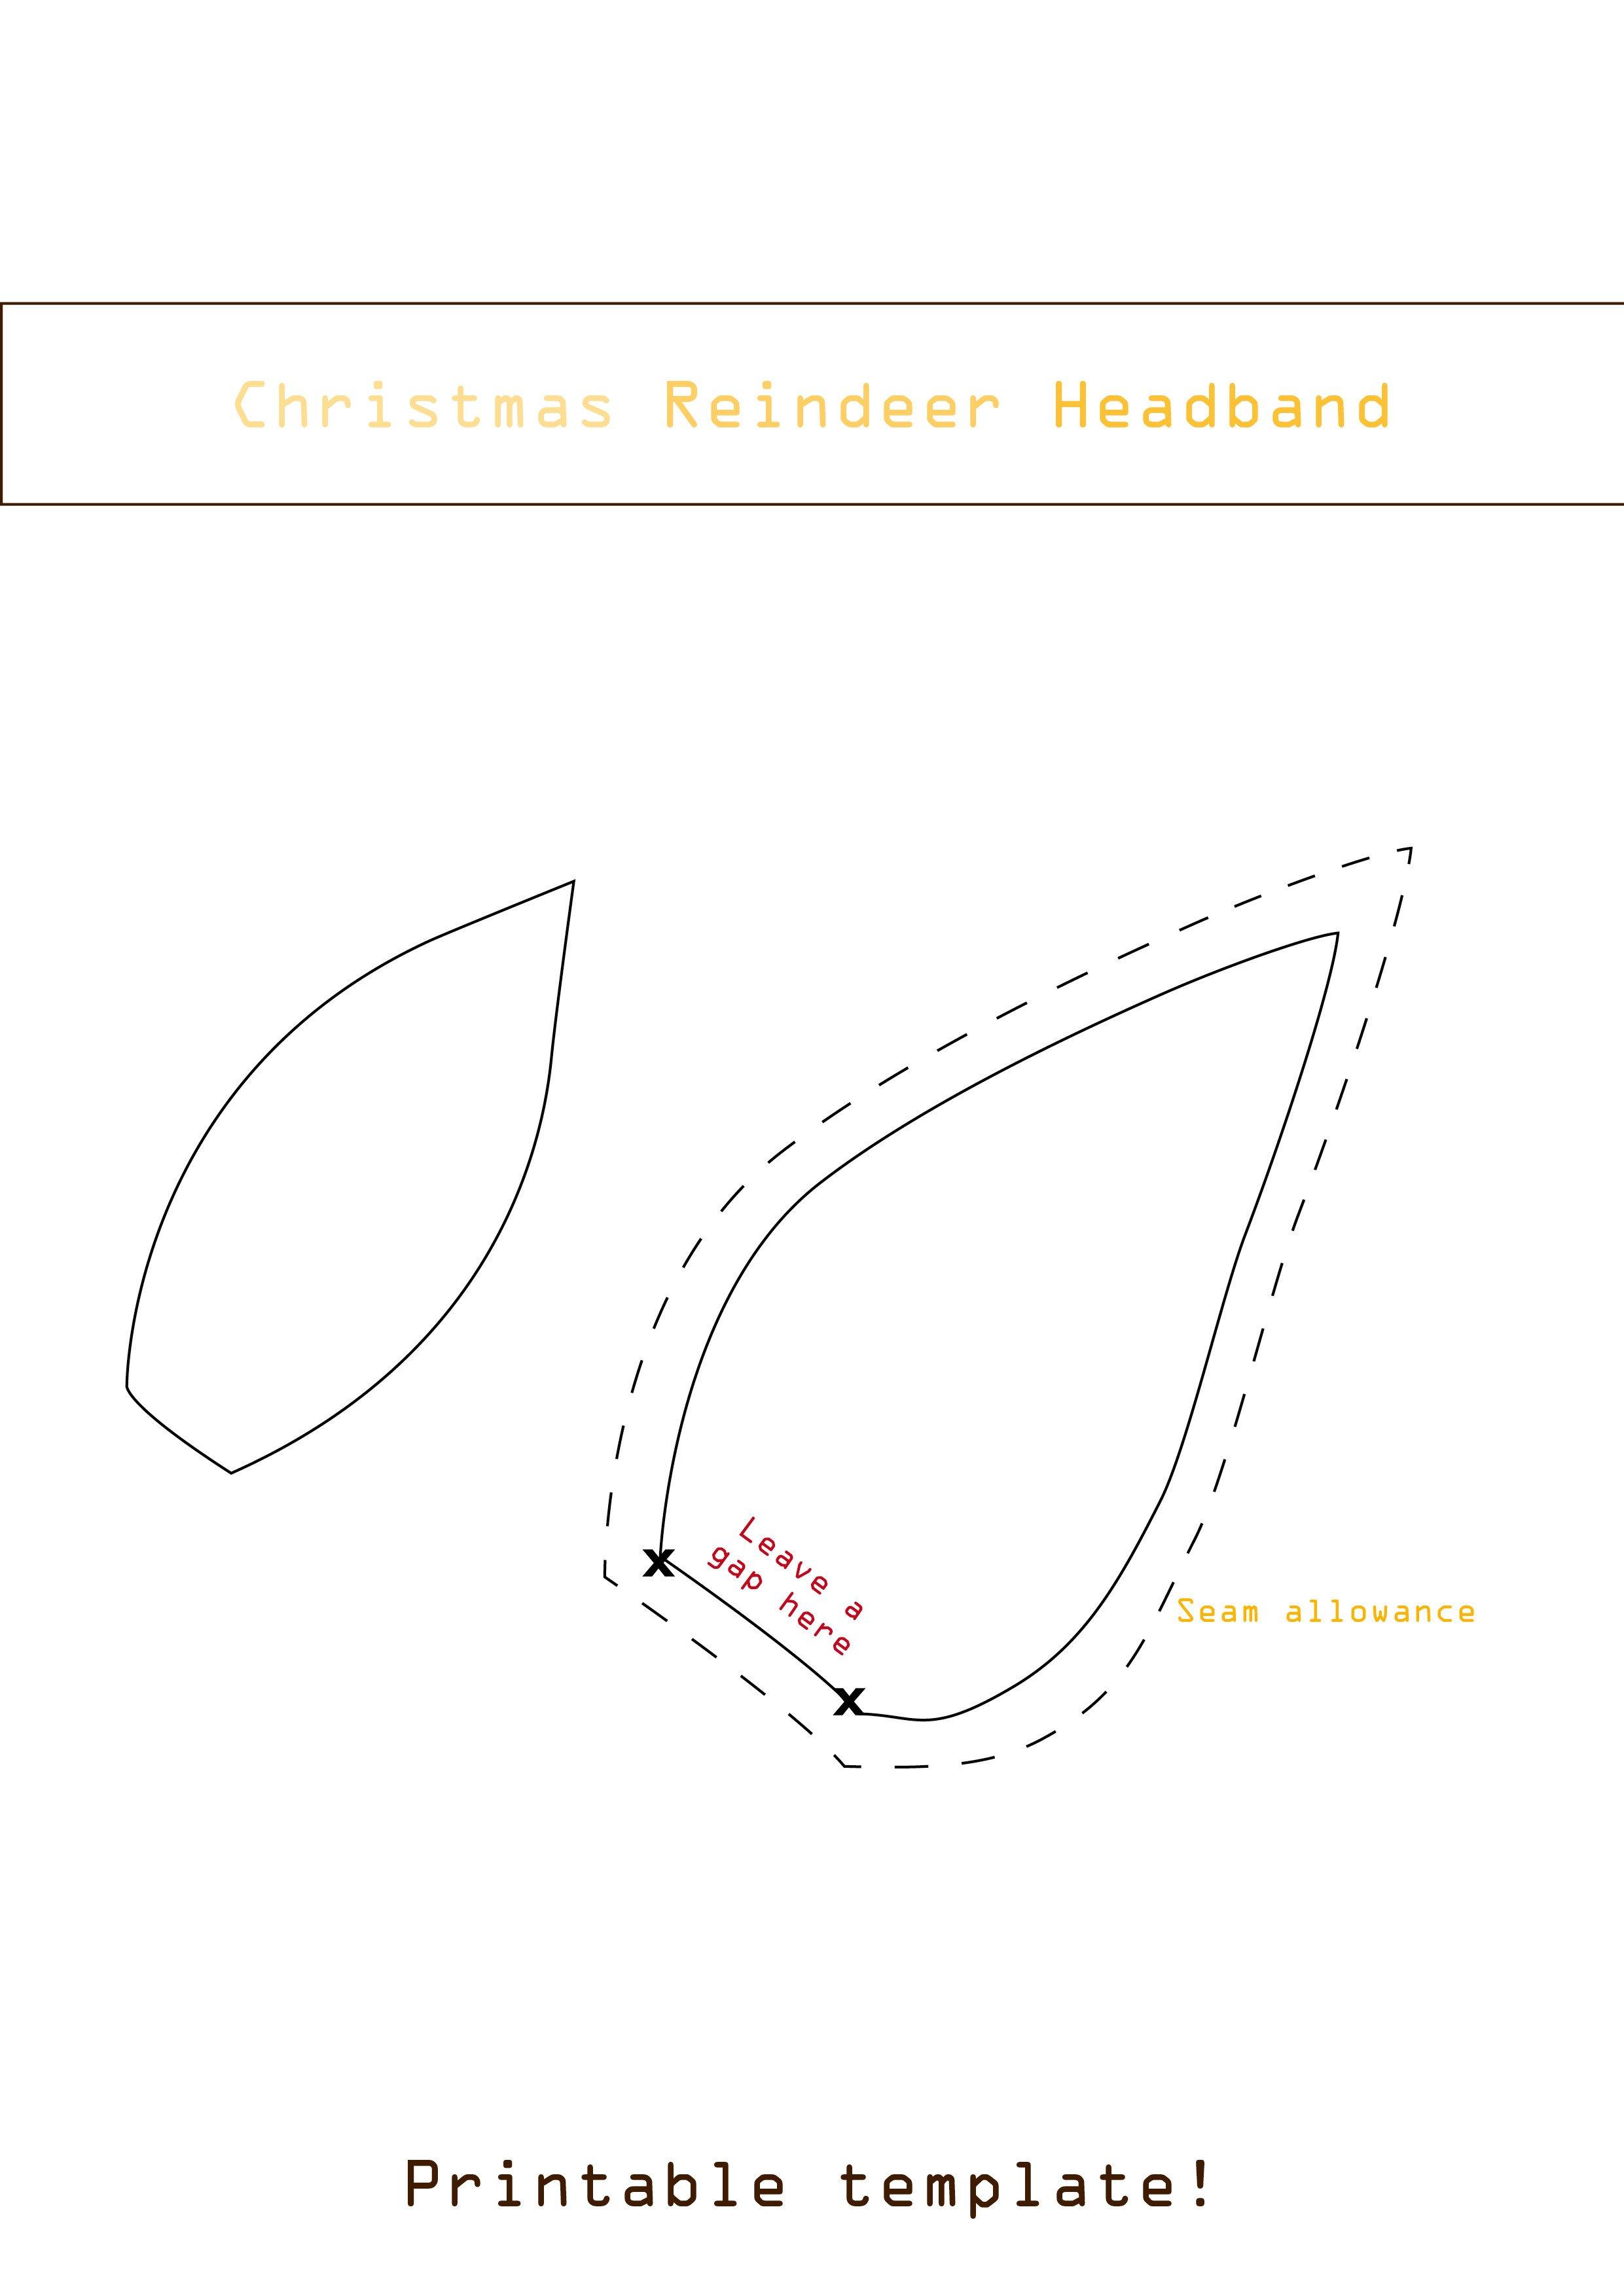 Deer Ear Template Easy Diy Christmas Reindeer Headband for Your Baby